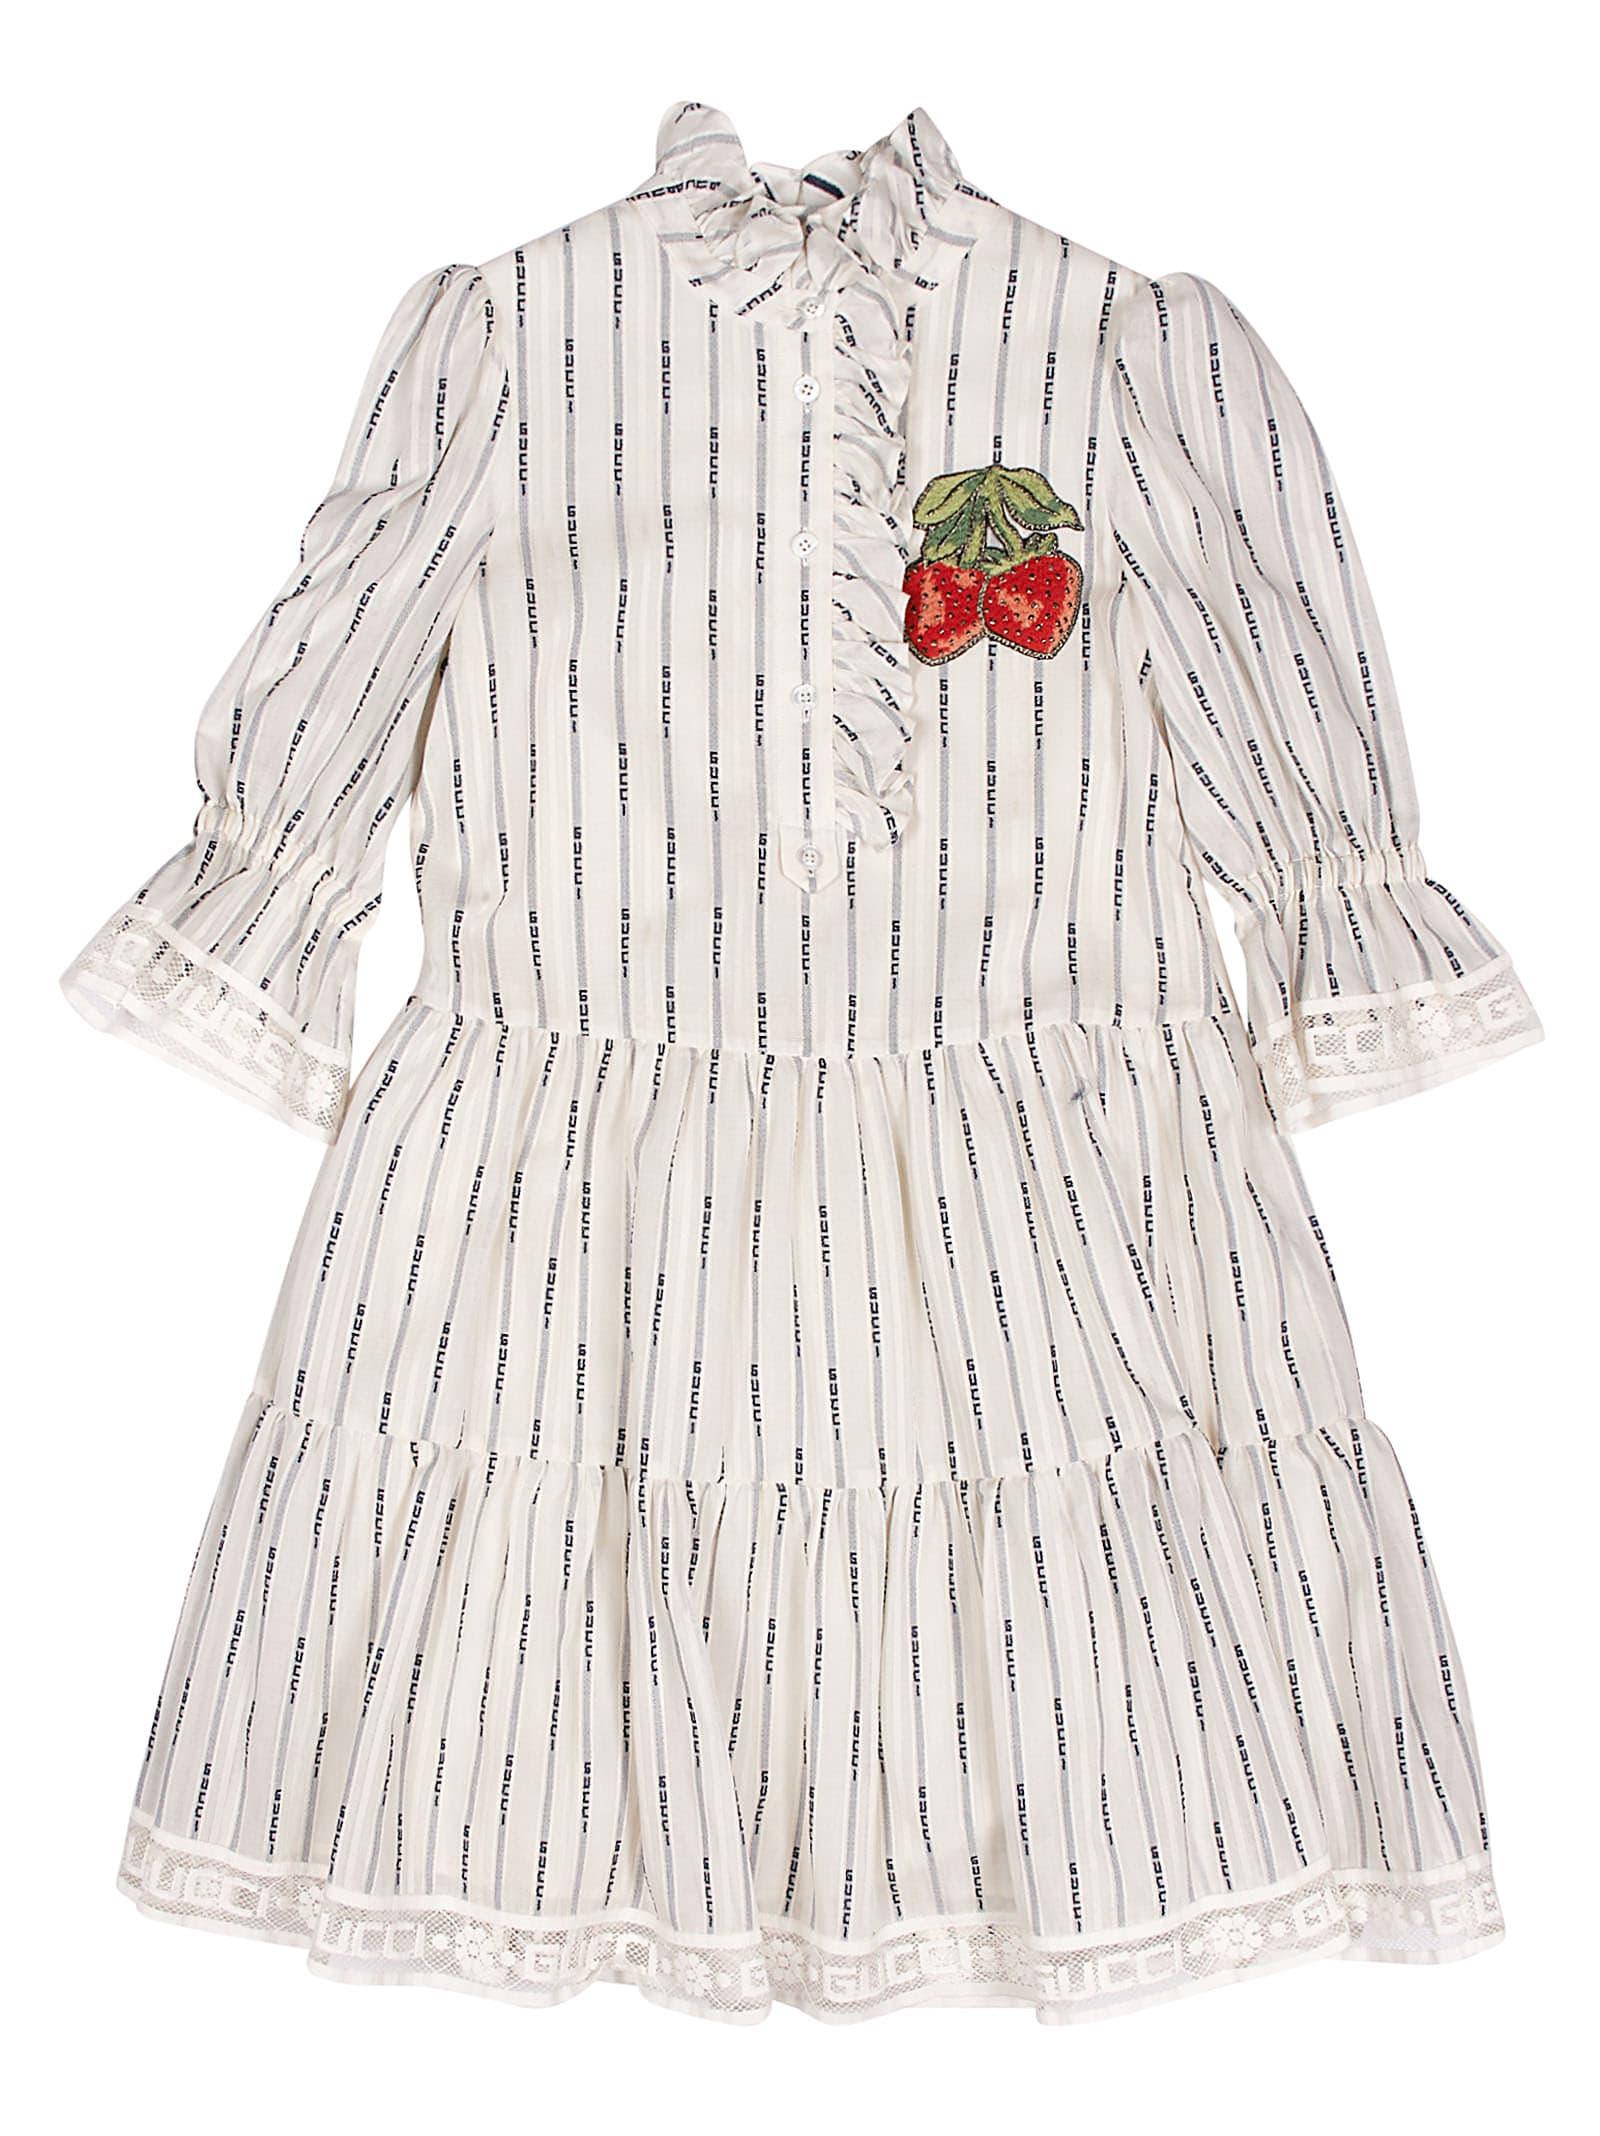 Gucci Jacquard S & s Dress